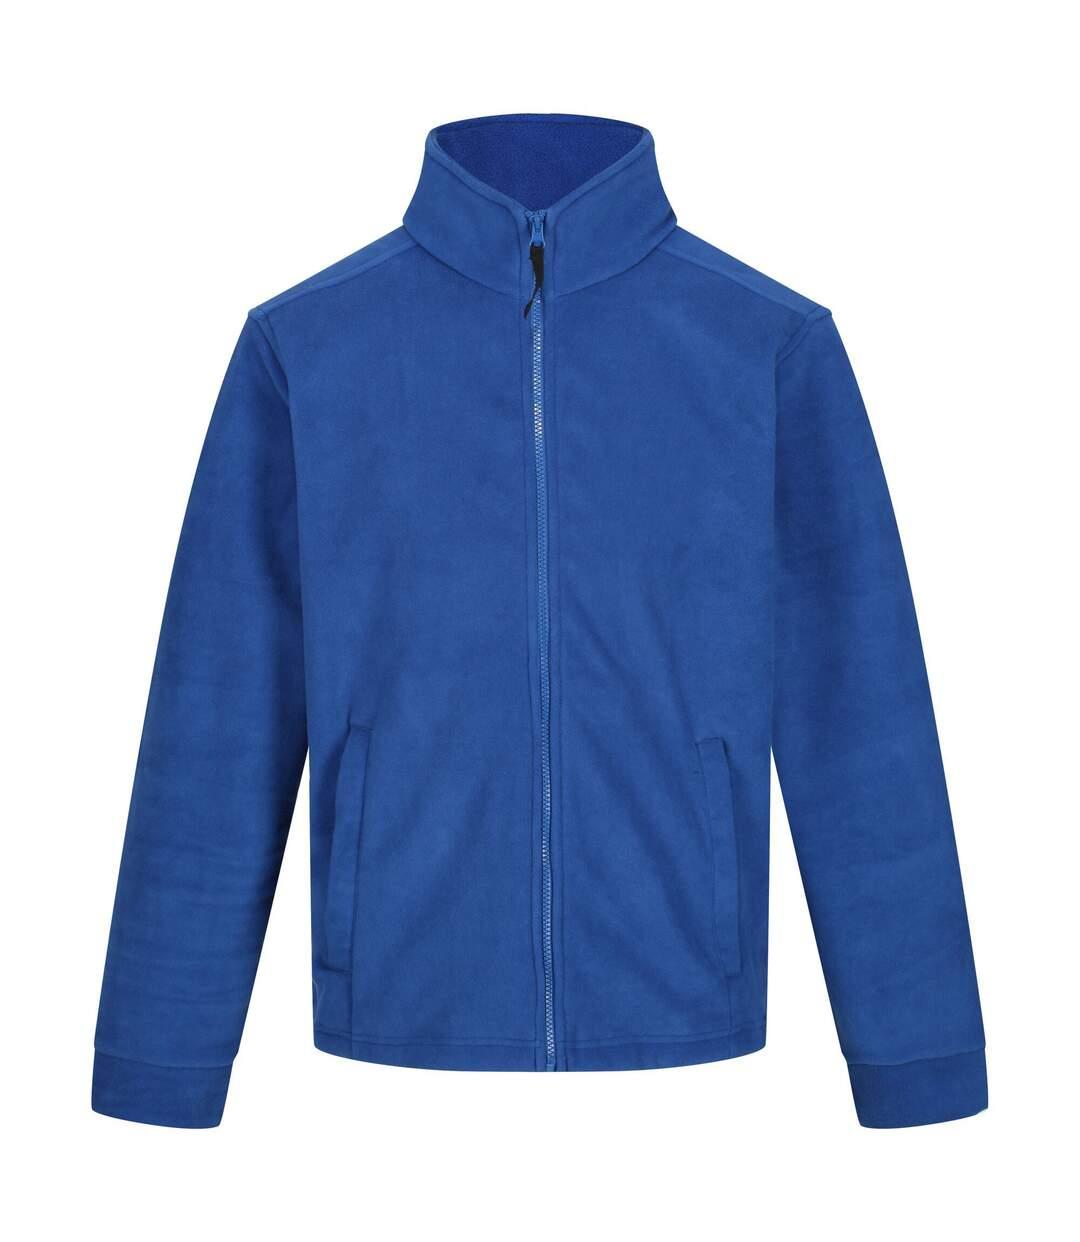 Regatta Professional Mens Thor 300 Fleece Jacket (Bottle Green) - UTRW3990